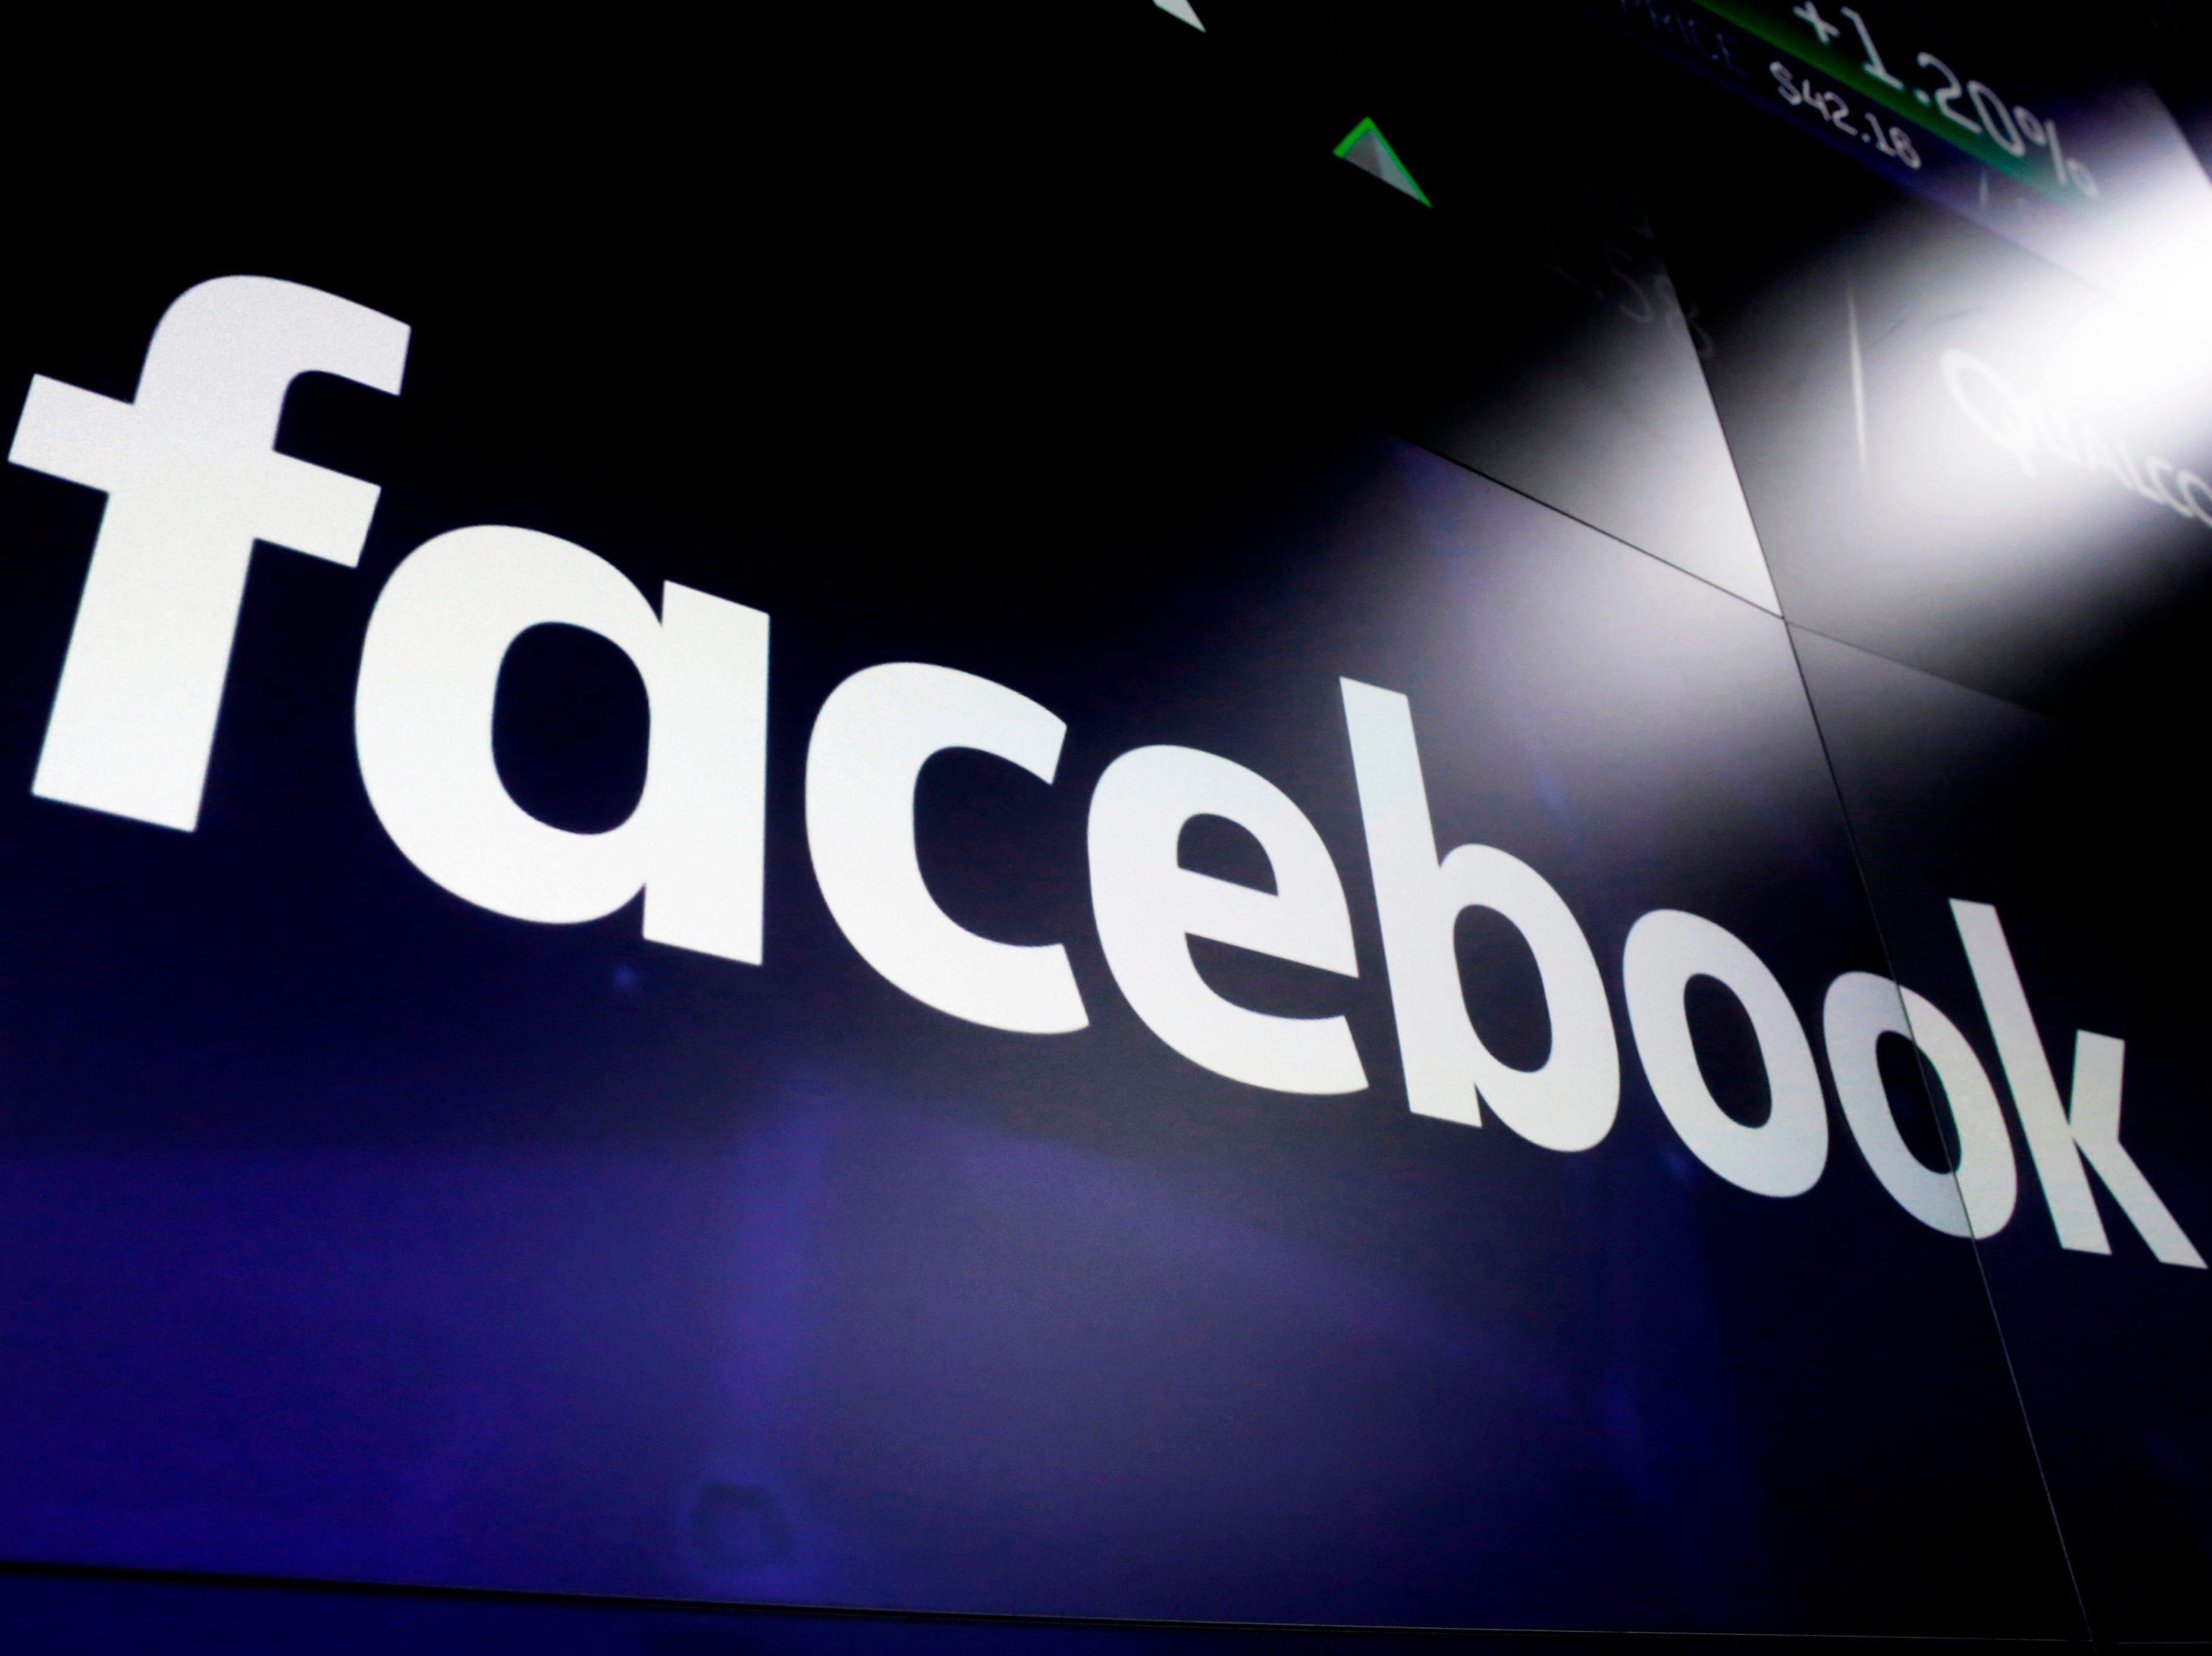 Break up Facebook?